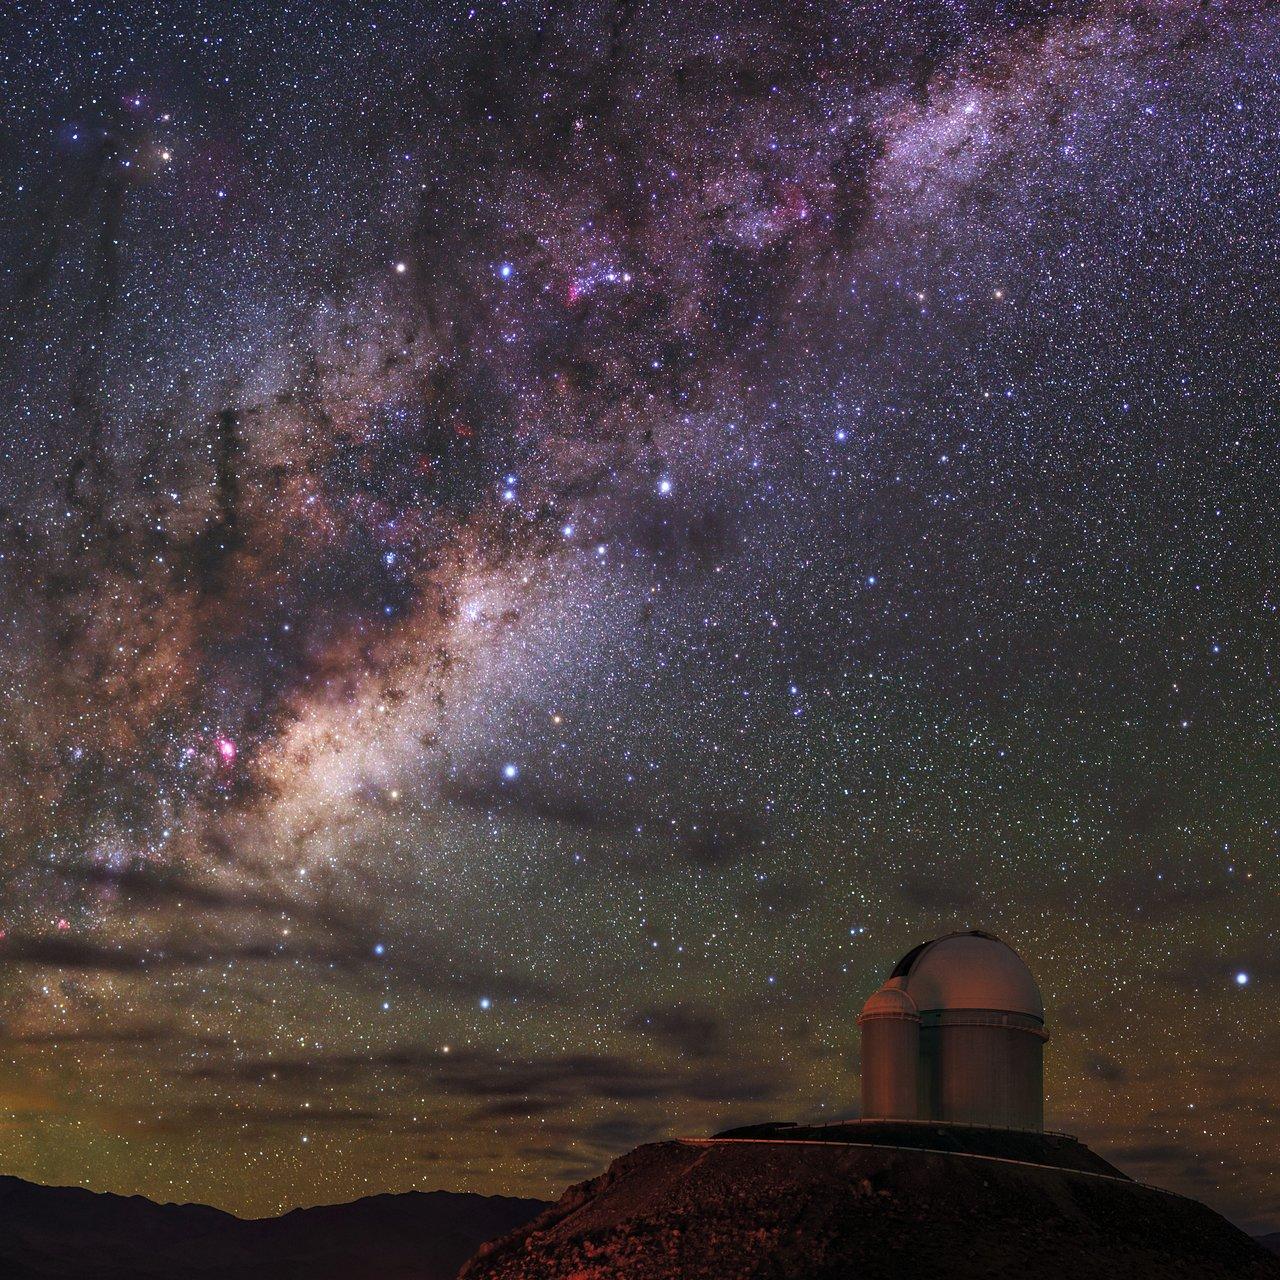 Radiance of Milky Way over La Silla